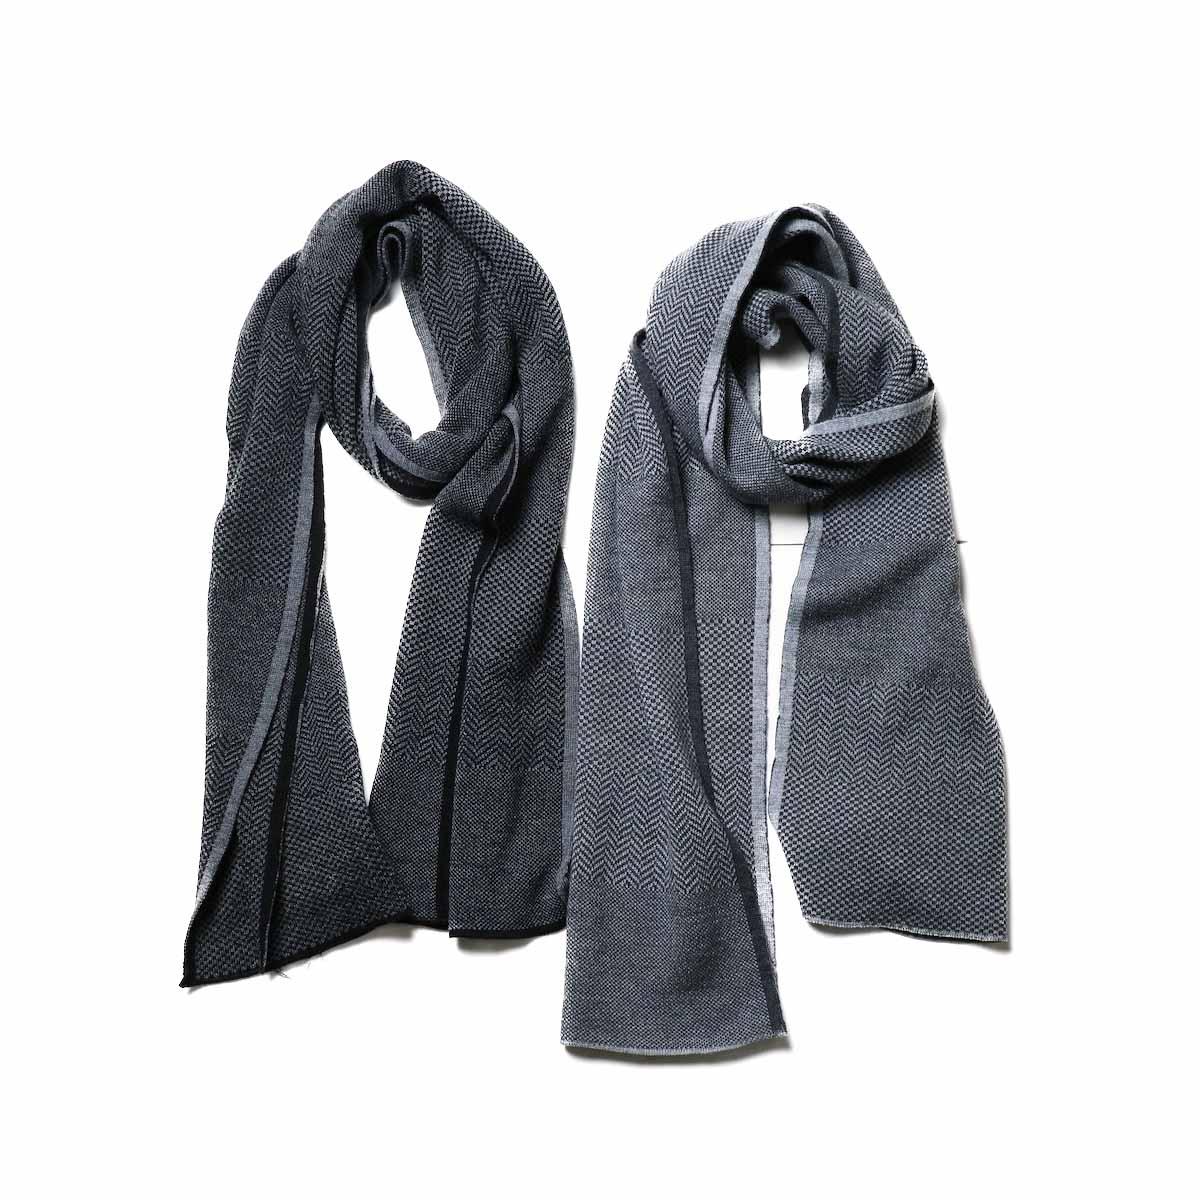 Engineered Garments / Knit Scarf - Wool HB